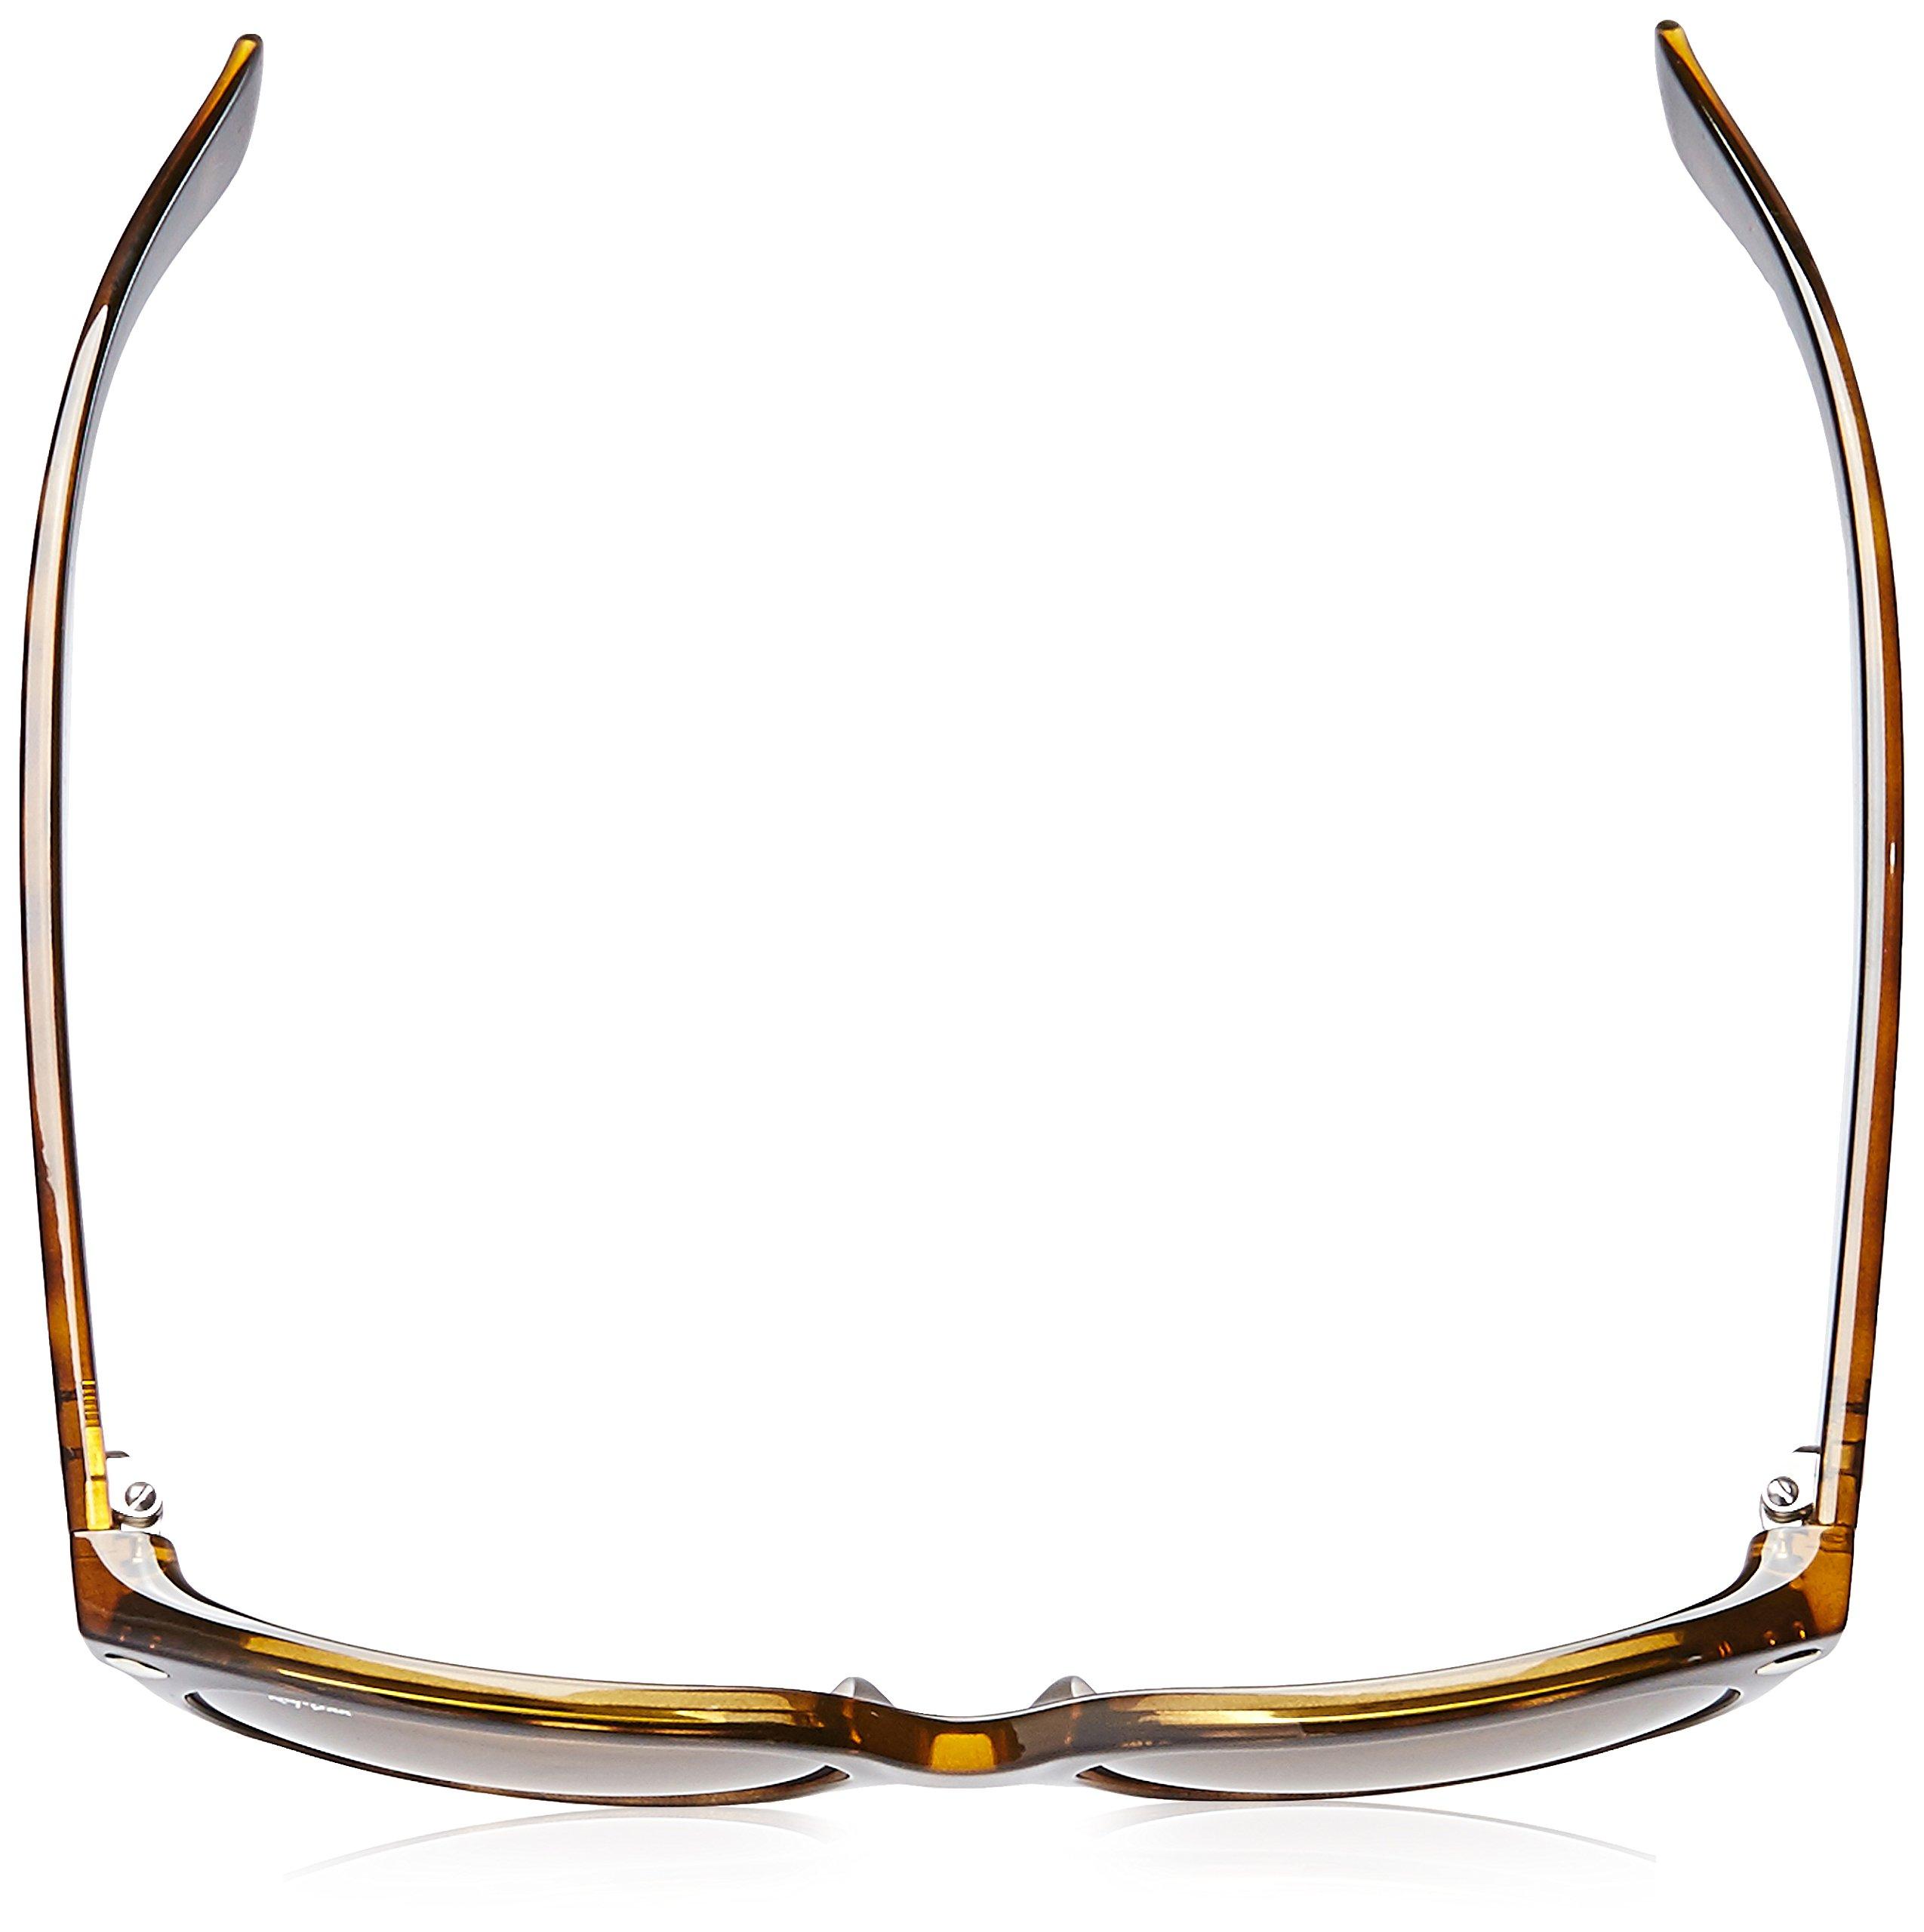 Ray-Ban, RB2132, New Wayfarer Sunglasses, Unisex Ray-Ban Sunglasses, 100% UV Protection, Polarized Wayfarer, Reduce Eye Strain, Lightweight Plastic Frame, Glass Lenses, 58 mm Frame by Ray-Ban (Image #4)